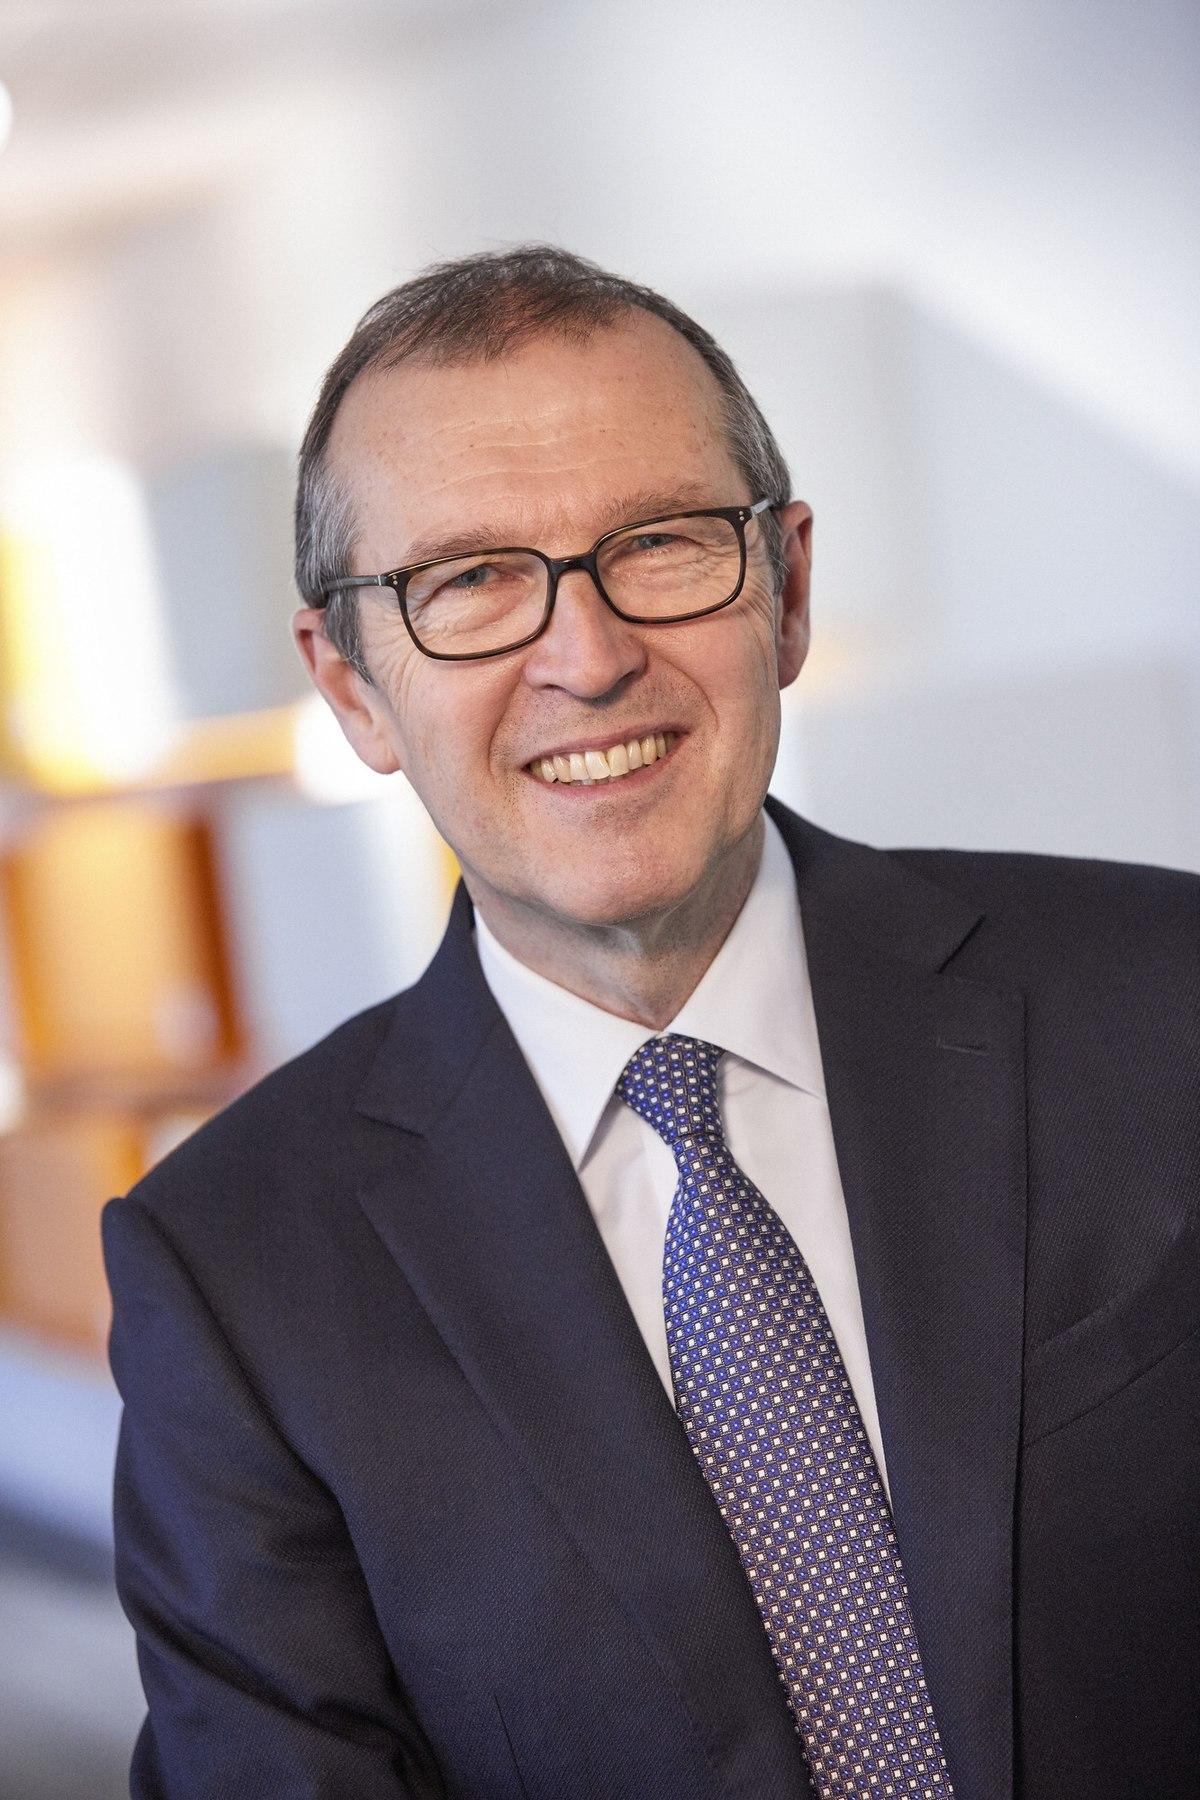 Markus hongler wikipedia for Versicherung mobiliar